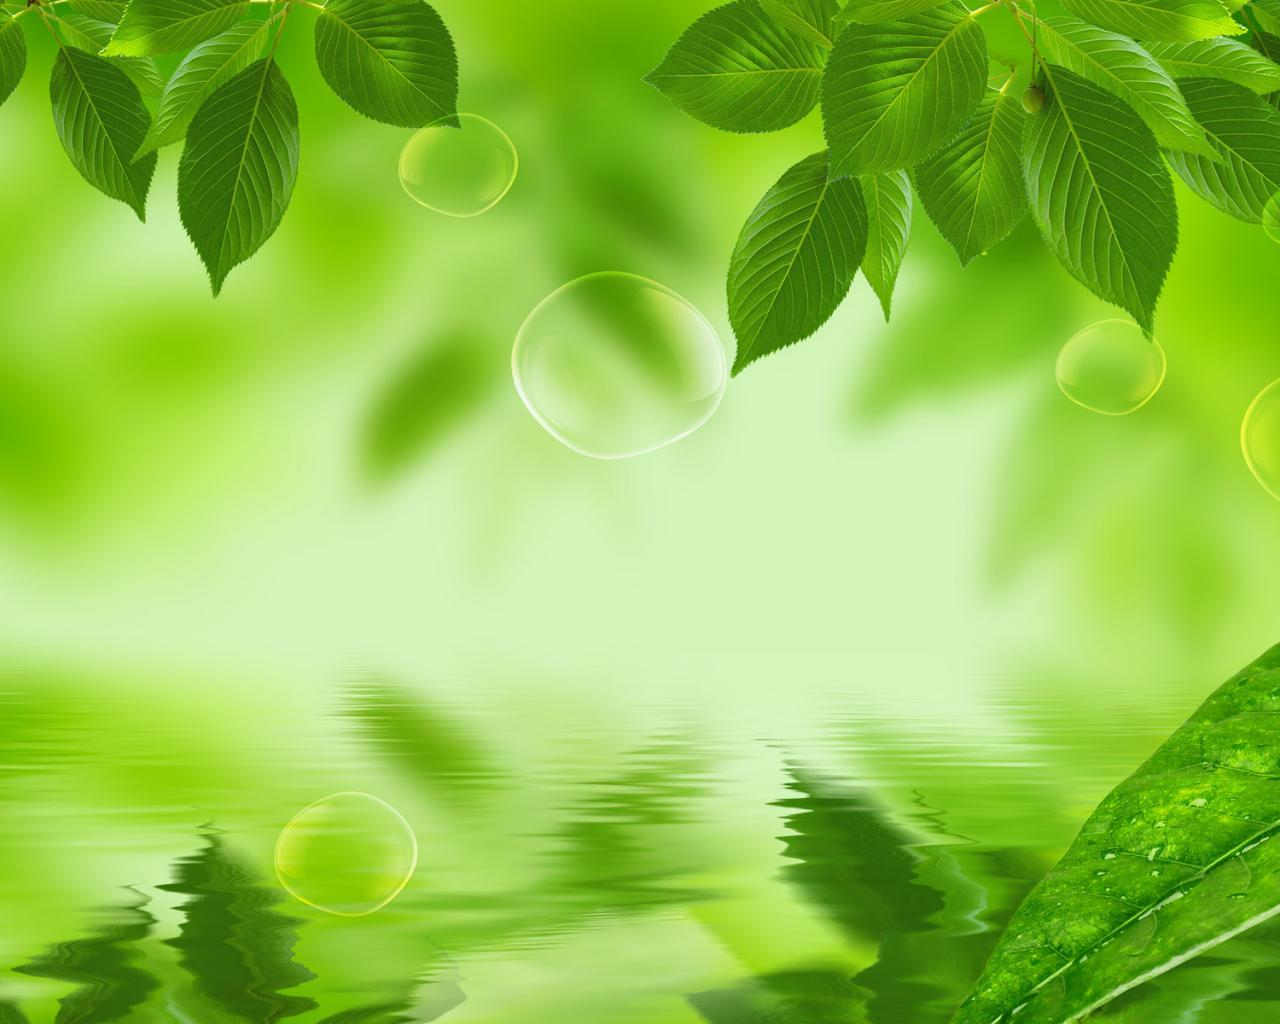 Nature Green Leaf Background - HD Wallpaper